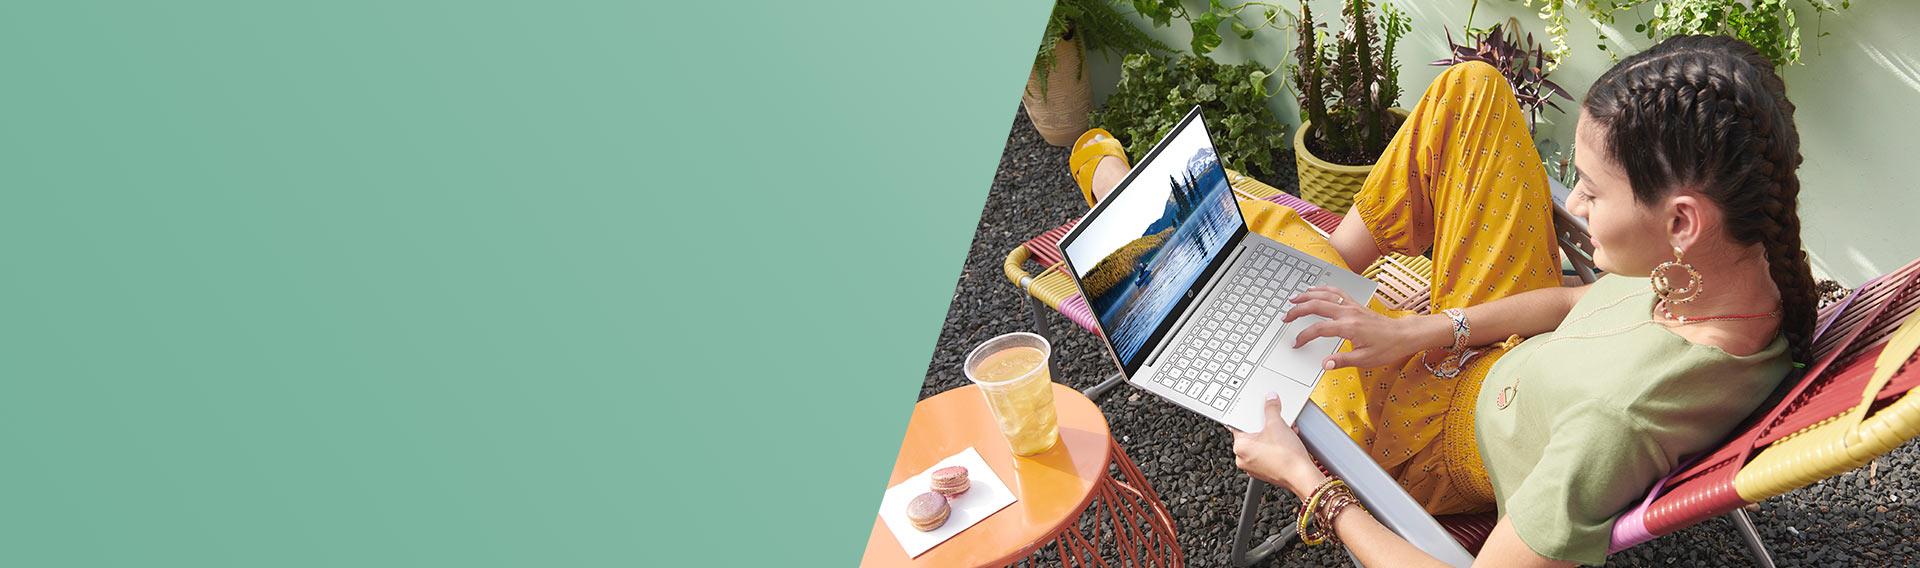 Grandes ahorros en laptops